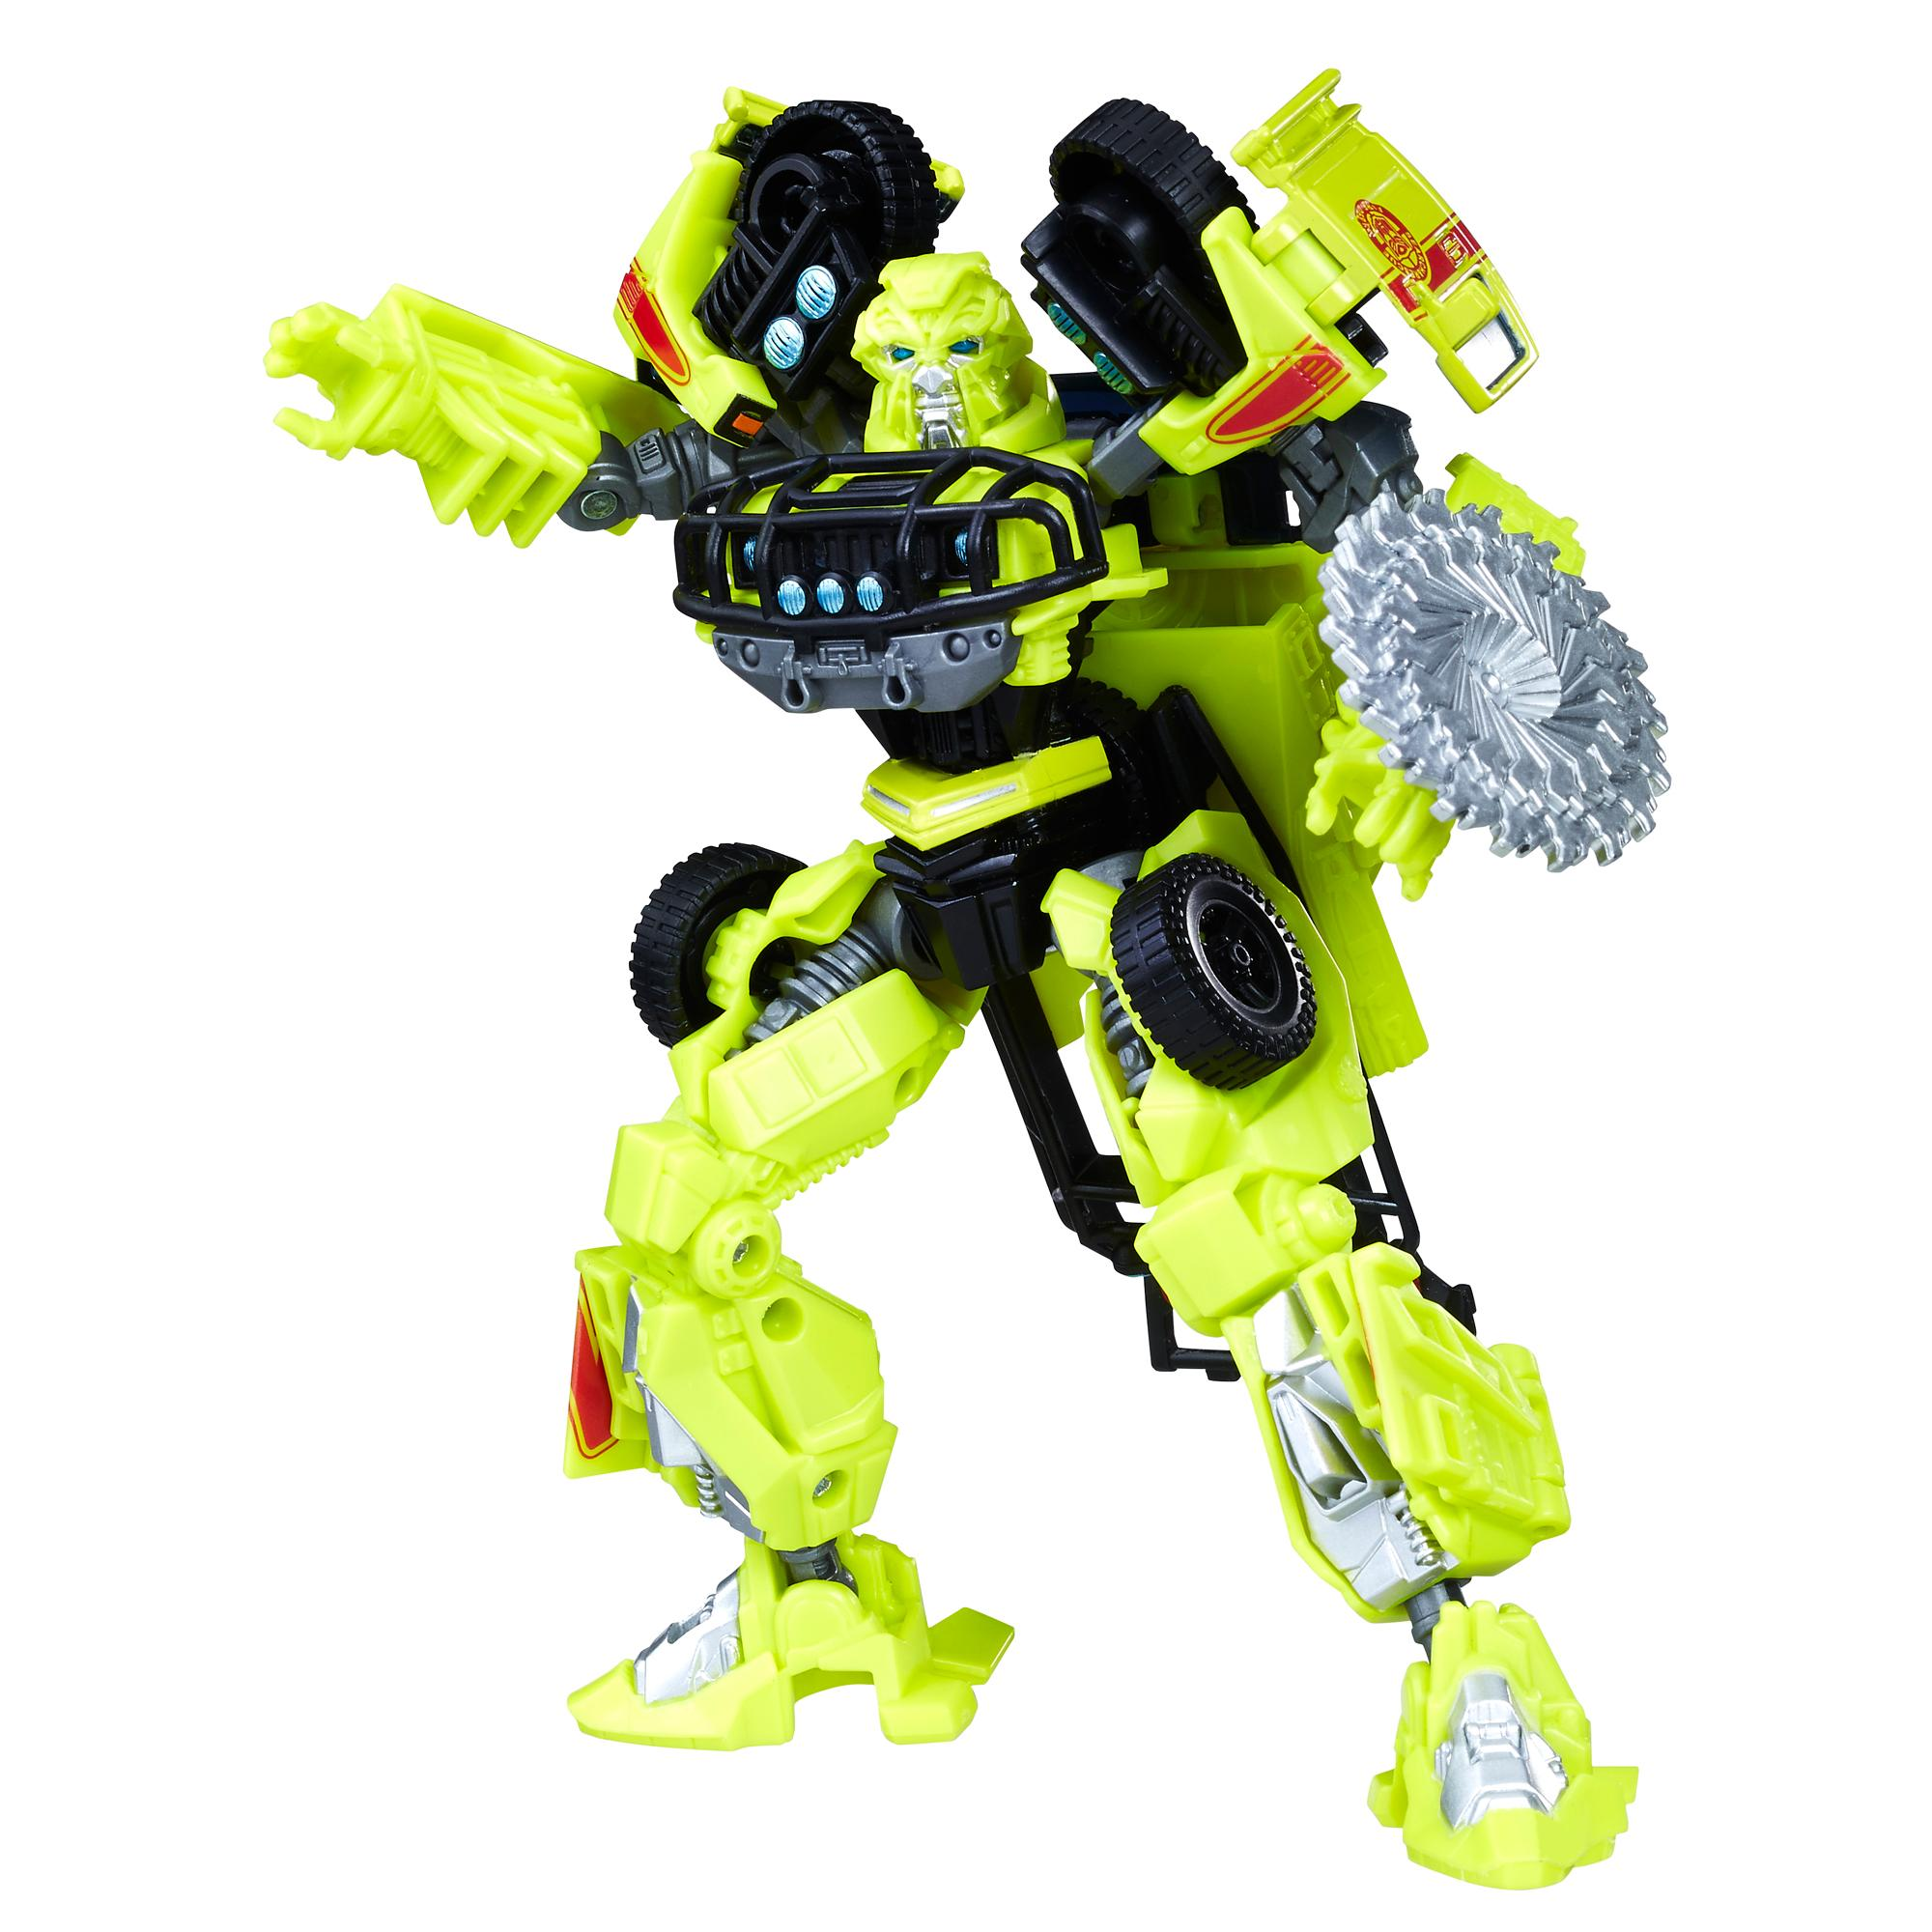 Transformers Filmleri Serisi Figür - Ratchet